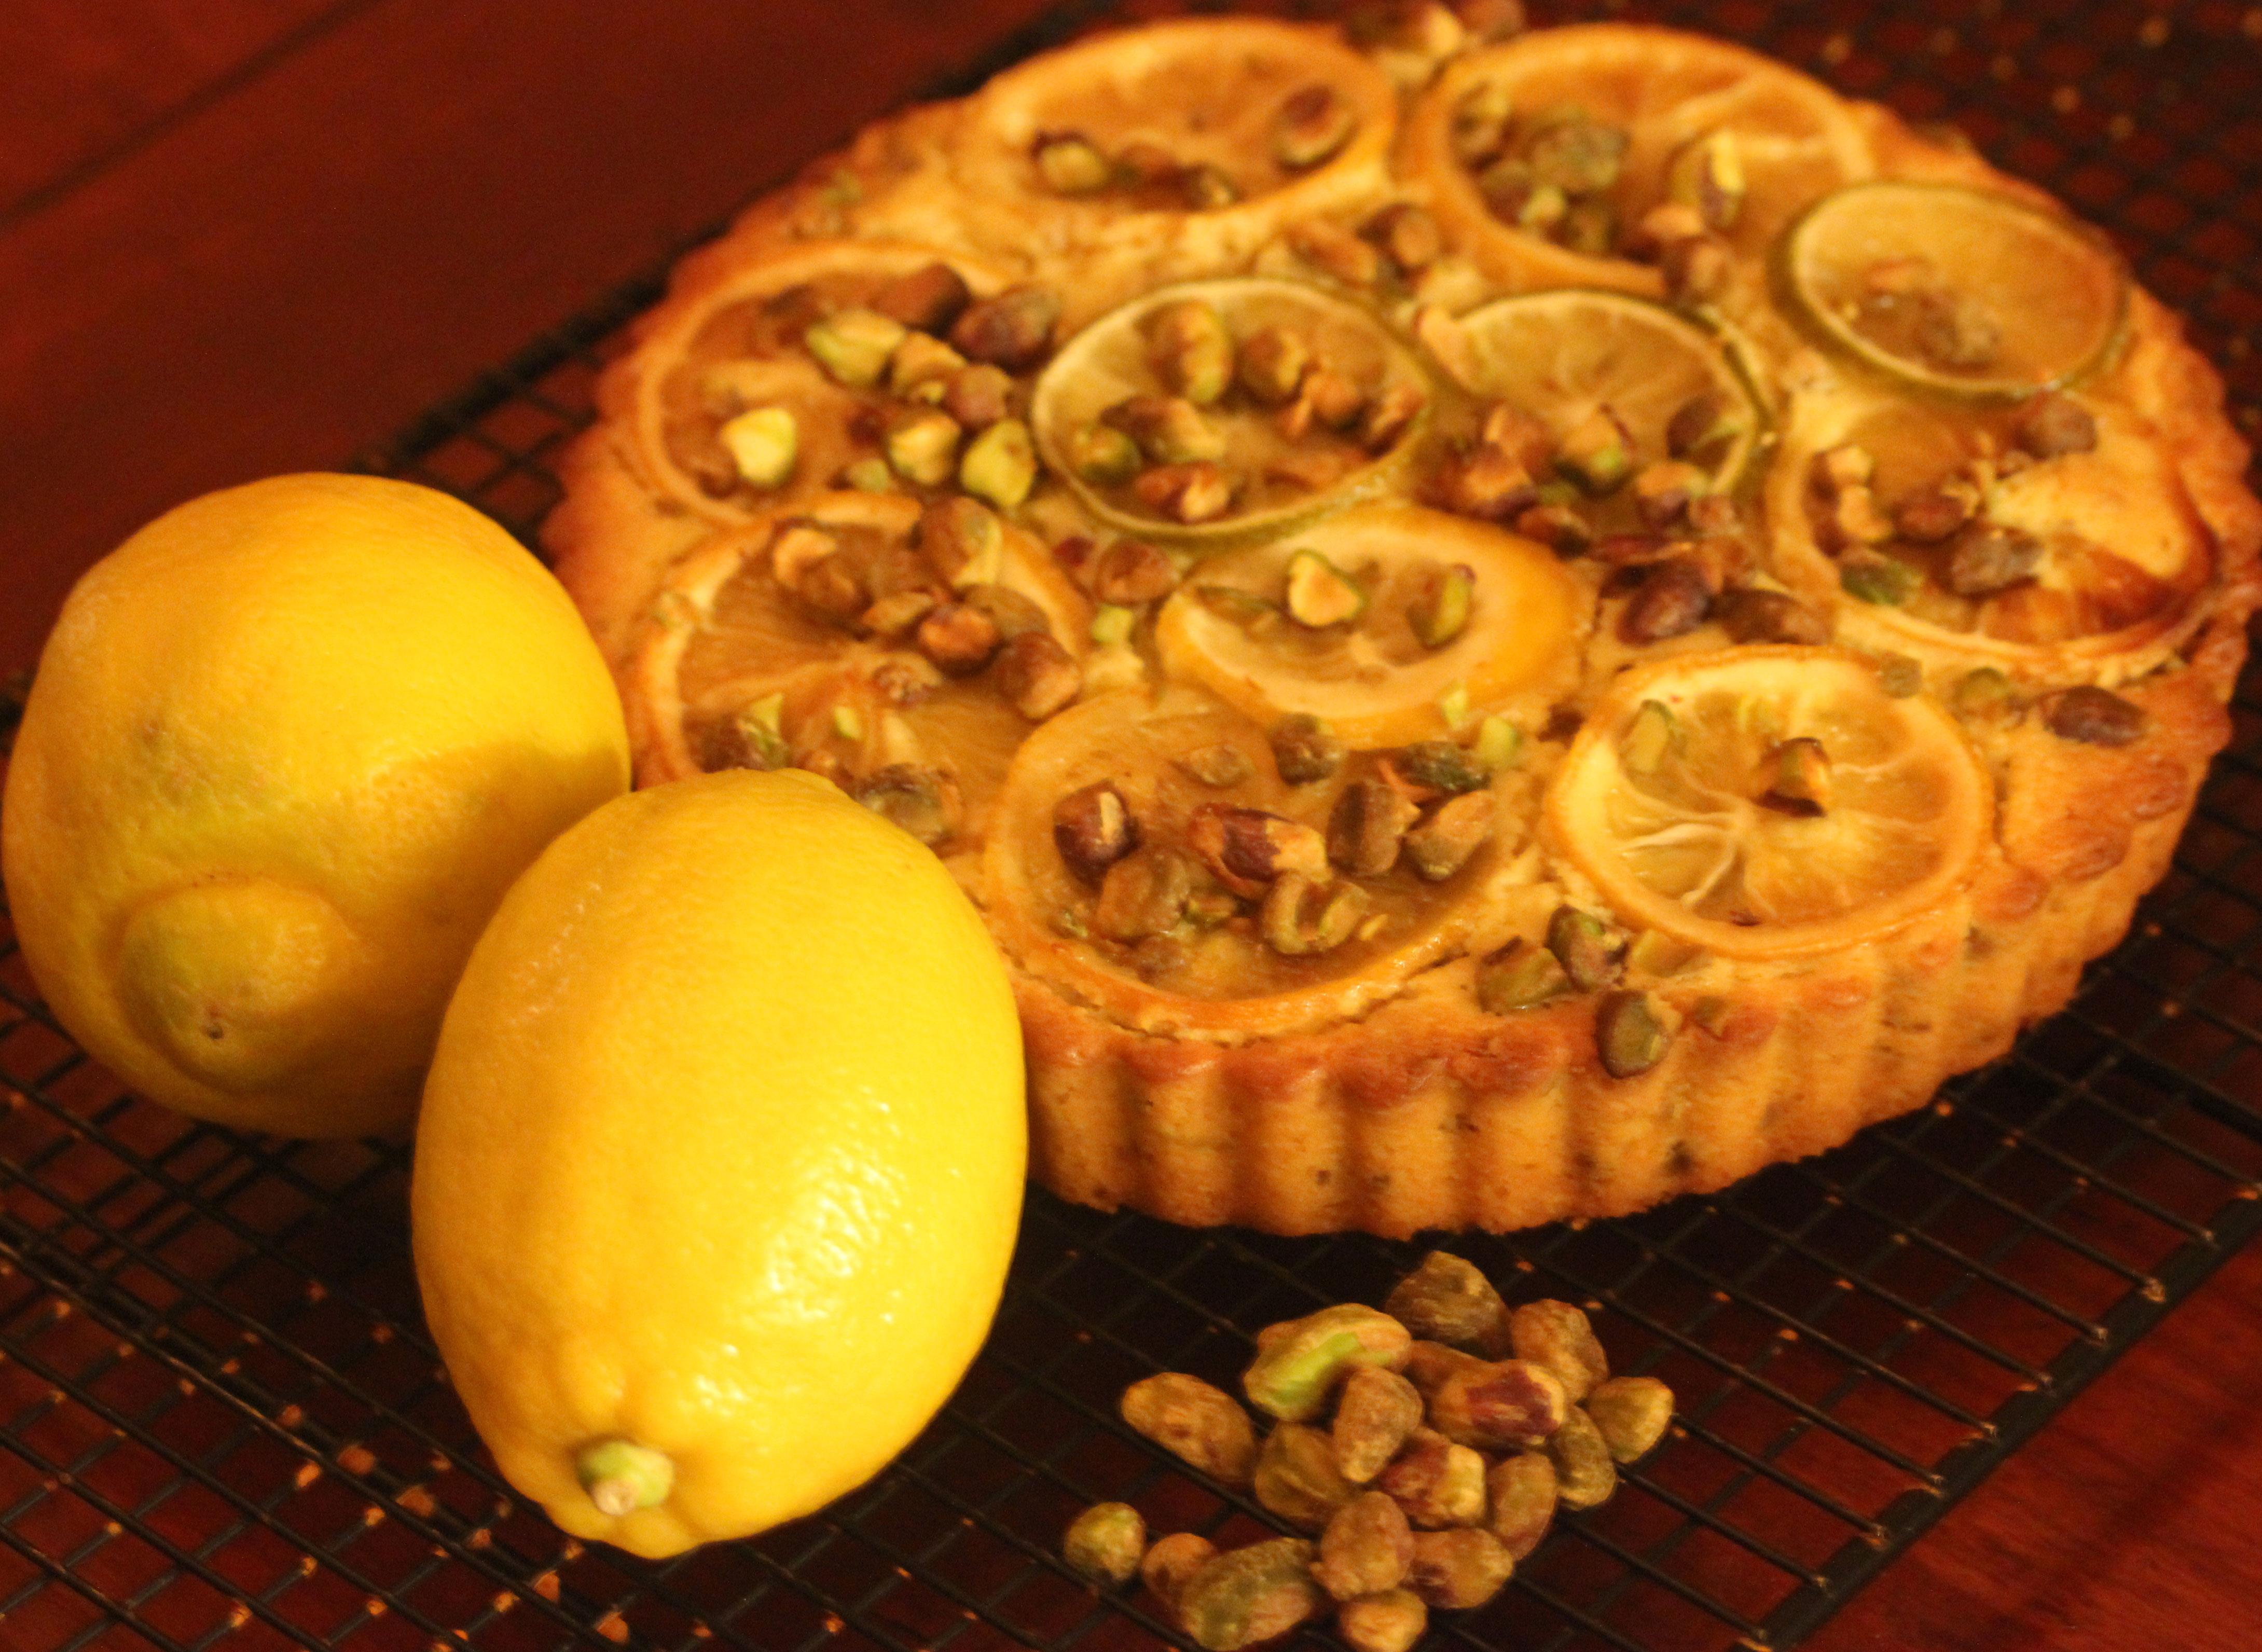 TBT Cookbook Review: World Class Cakes